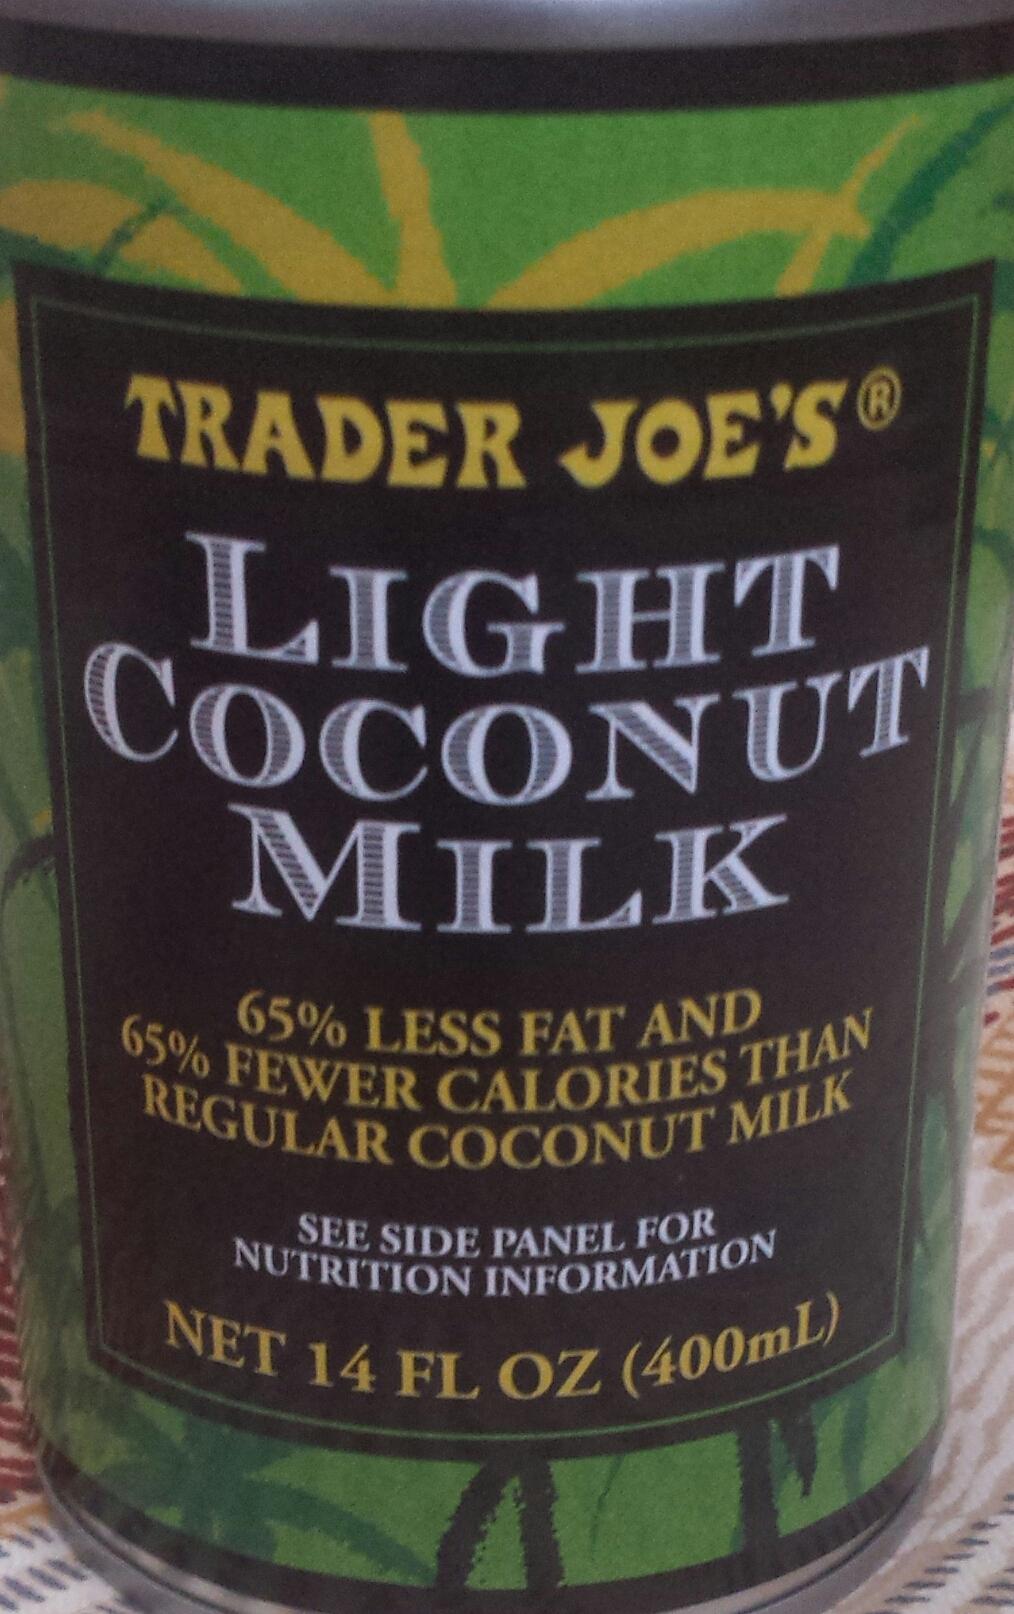 #RepealTheSeal - Light Coconut Milk.jpg